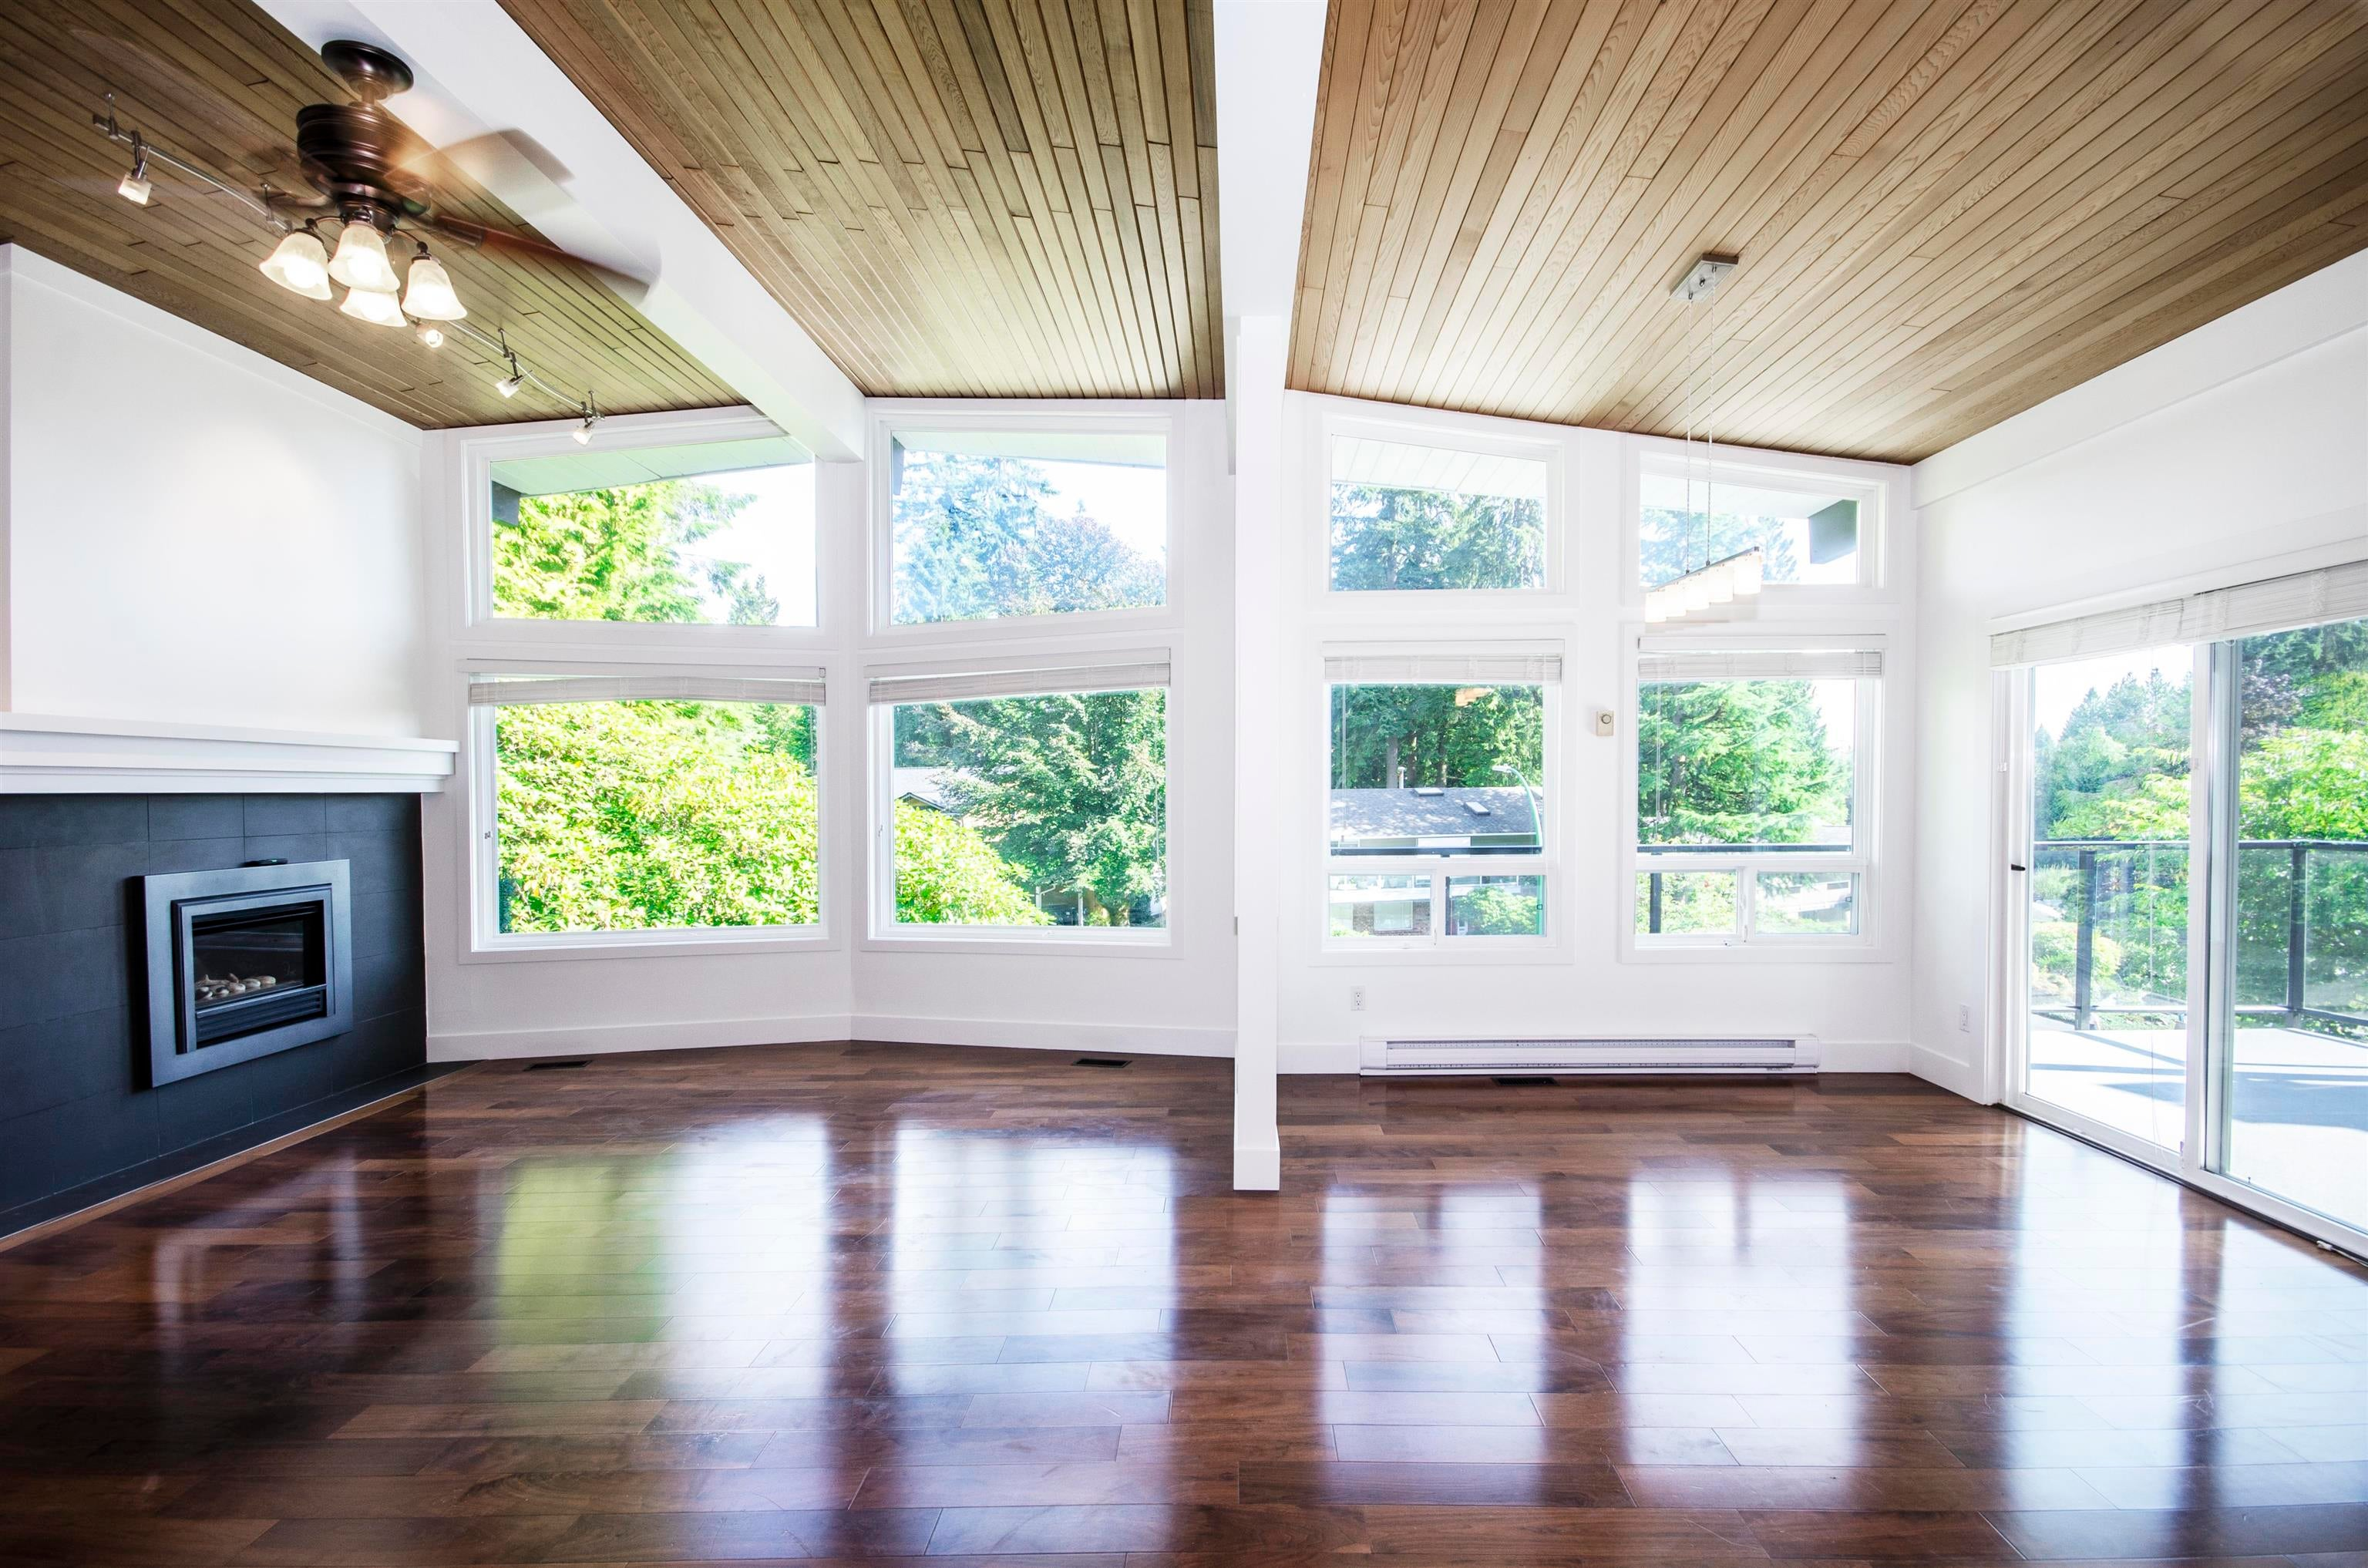 3785 REGENT AVENUE - Upper Lonsdale House/Single Family for sale, 4 Bedrooms (R2617648) - #4